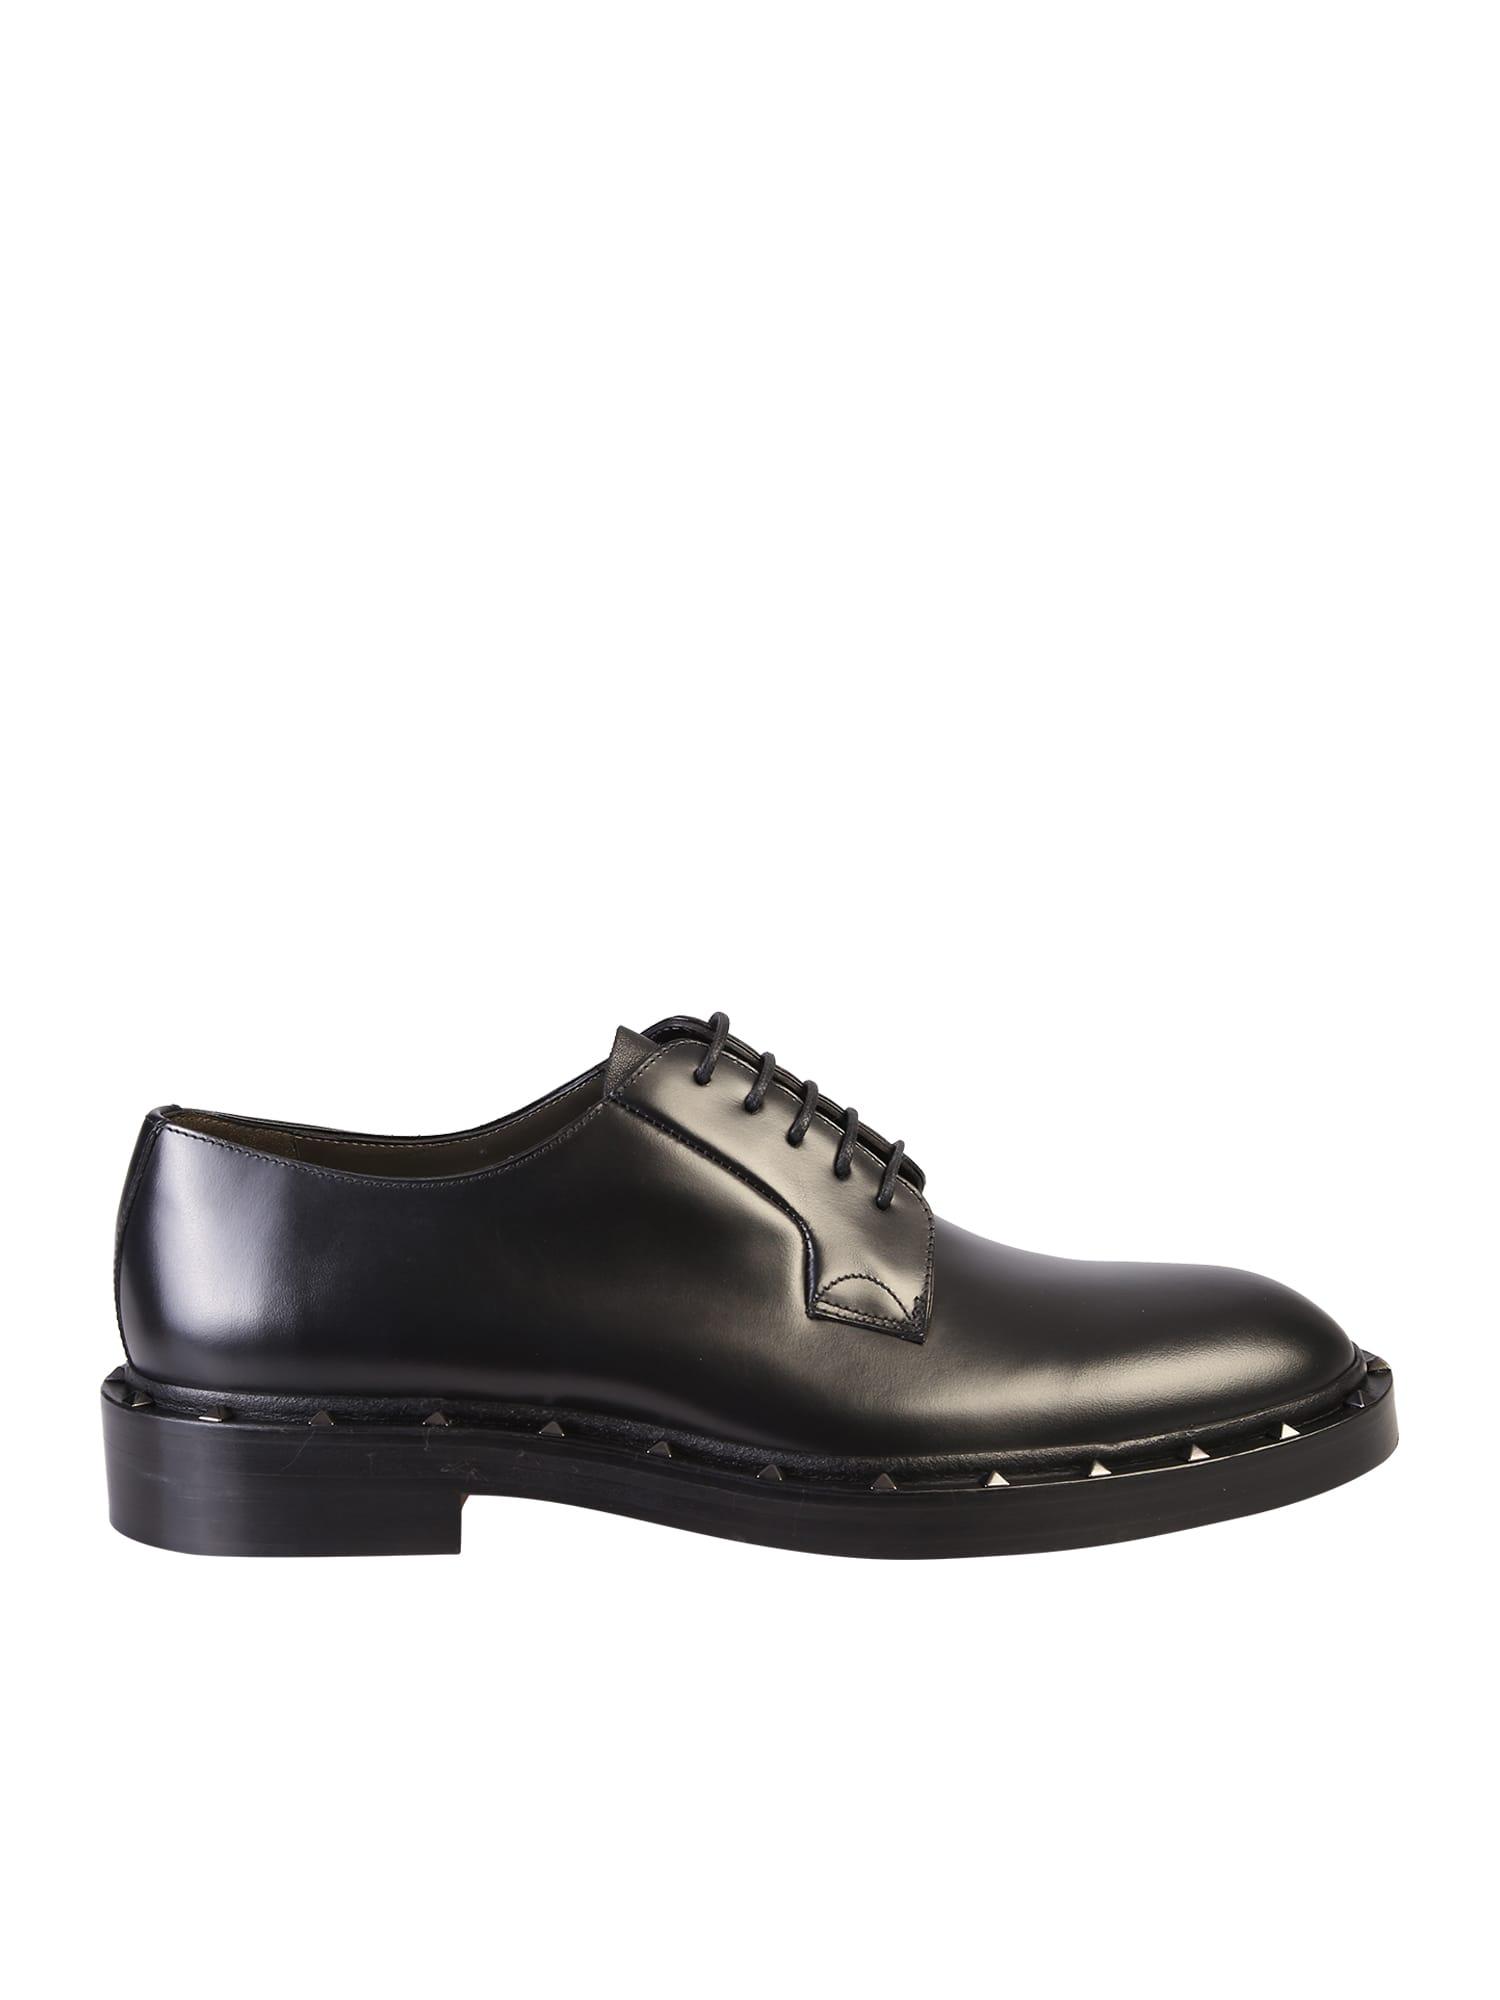 Valentino Garavani Studded Derby Shoes